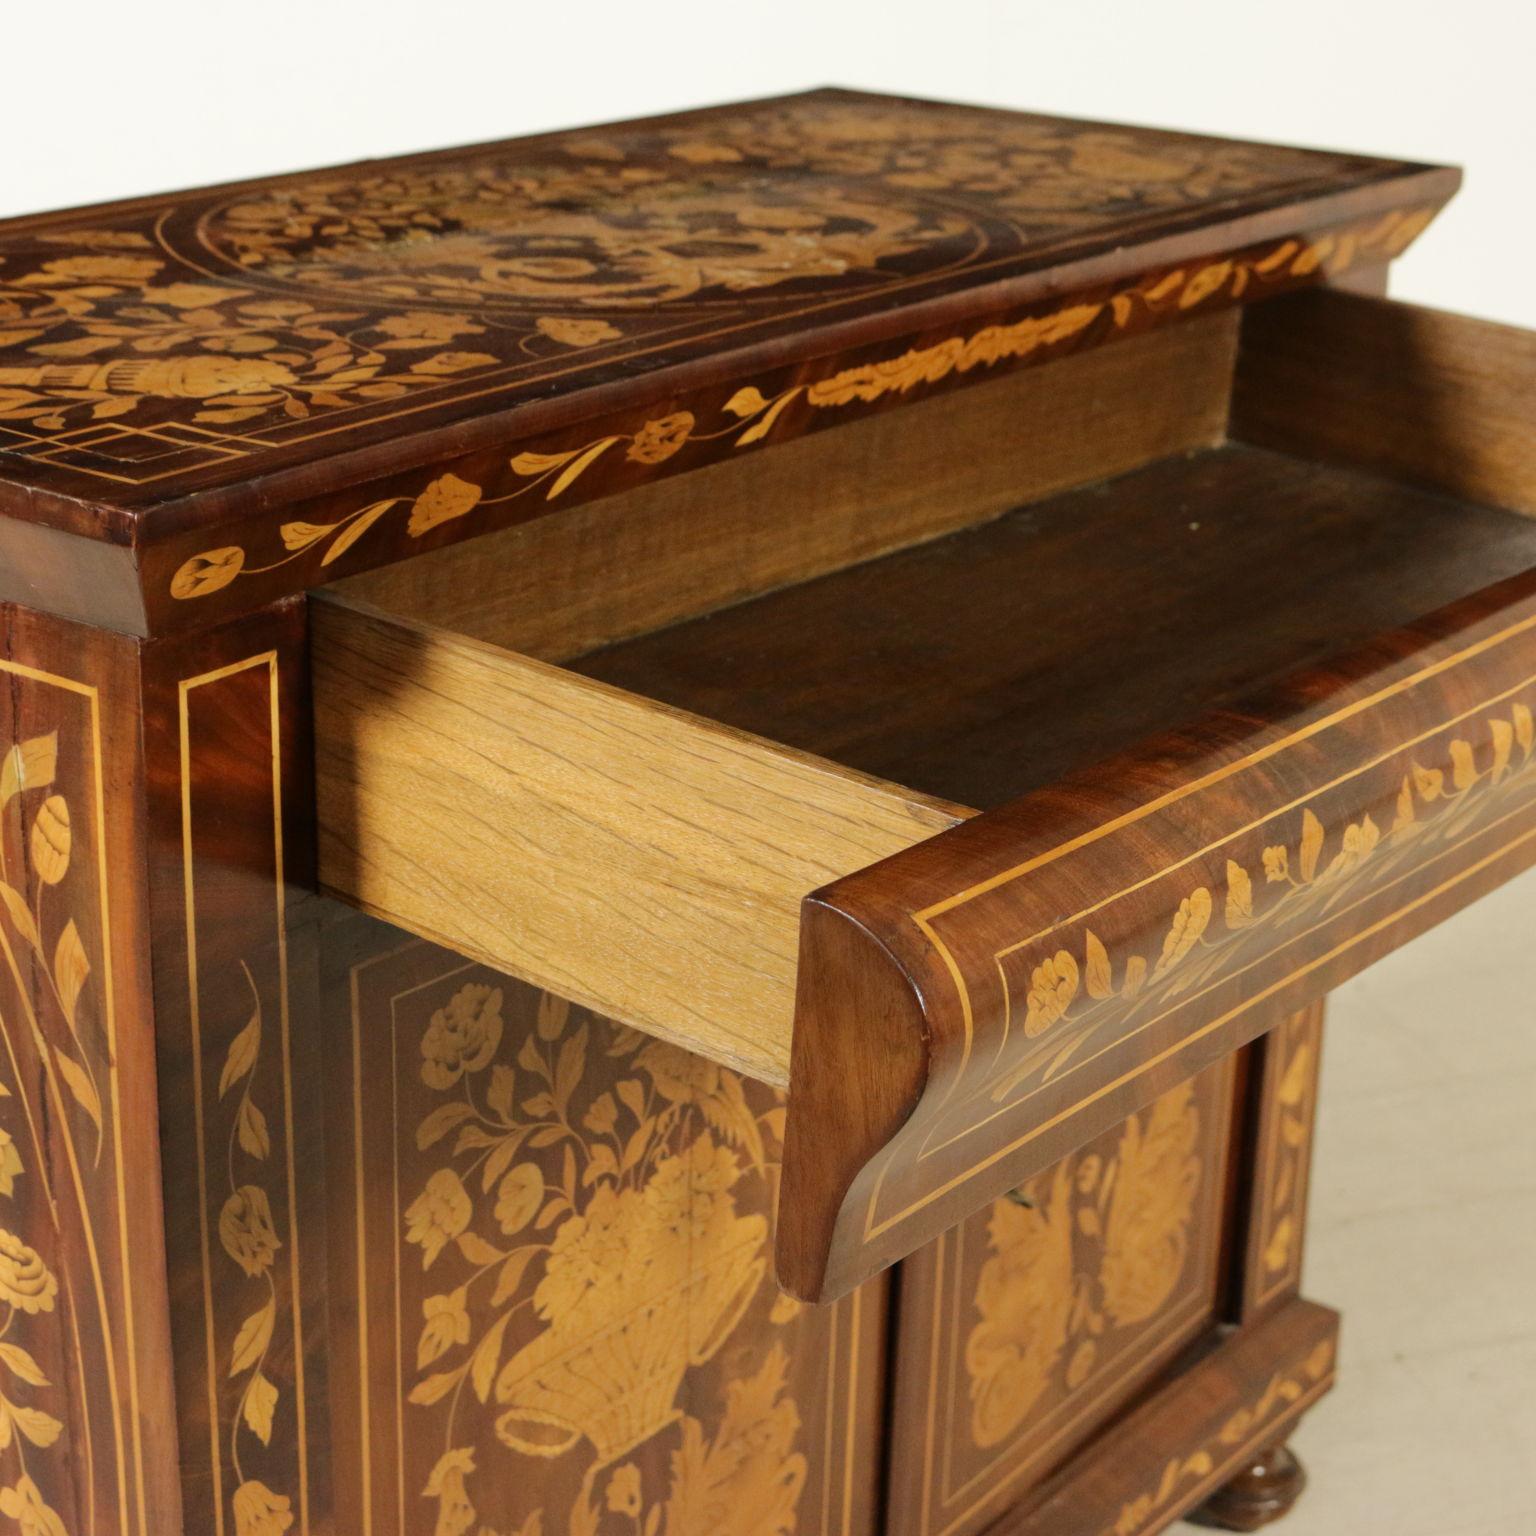 Credenza intarsiata olandese credenze antiquariato for Antiquariato mobili